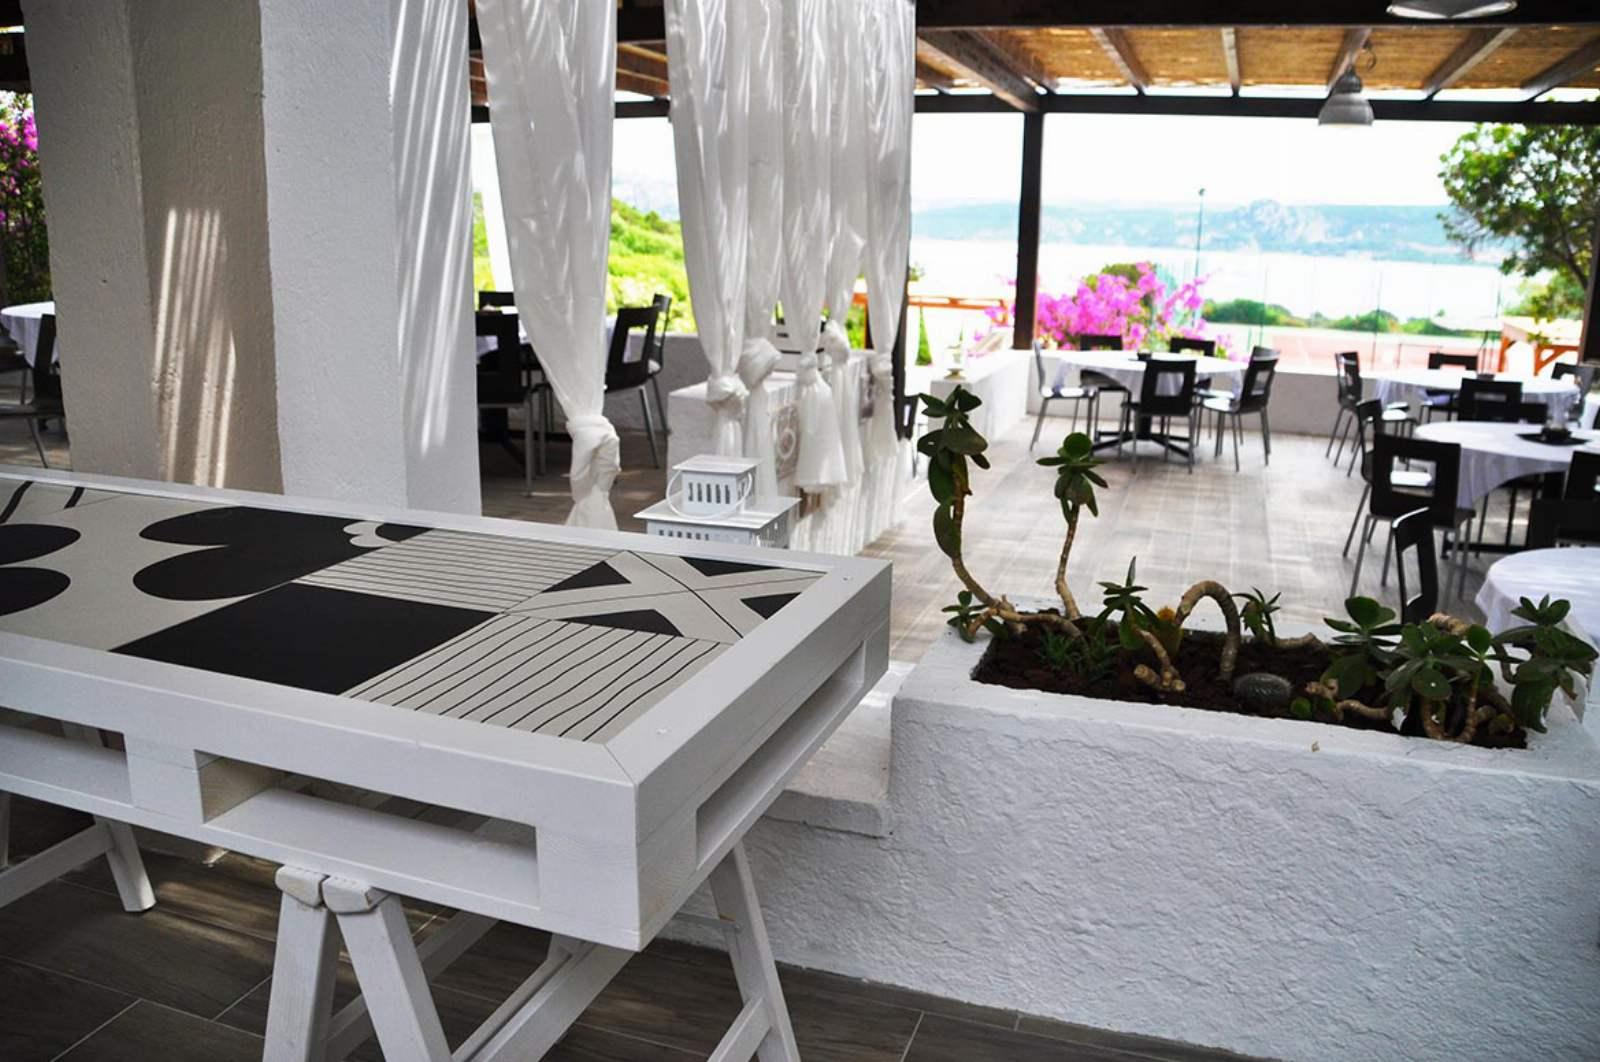 Santo Stefano Resort: room / property / locale photo. Image 10